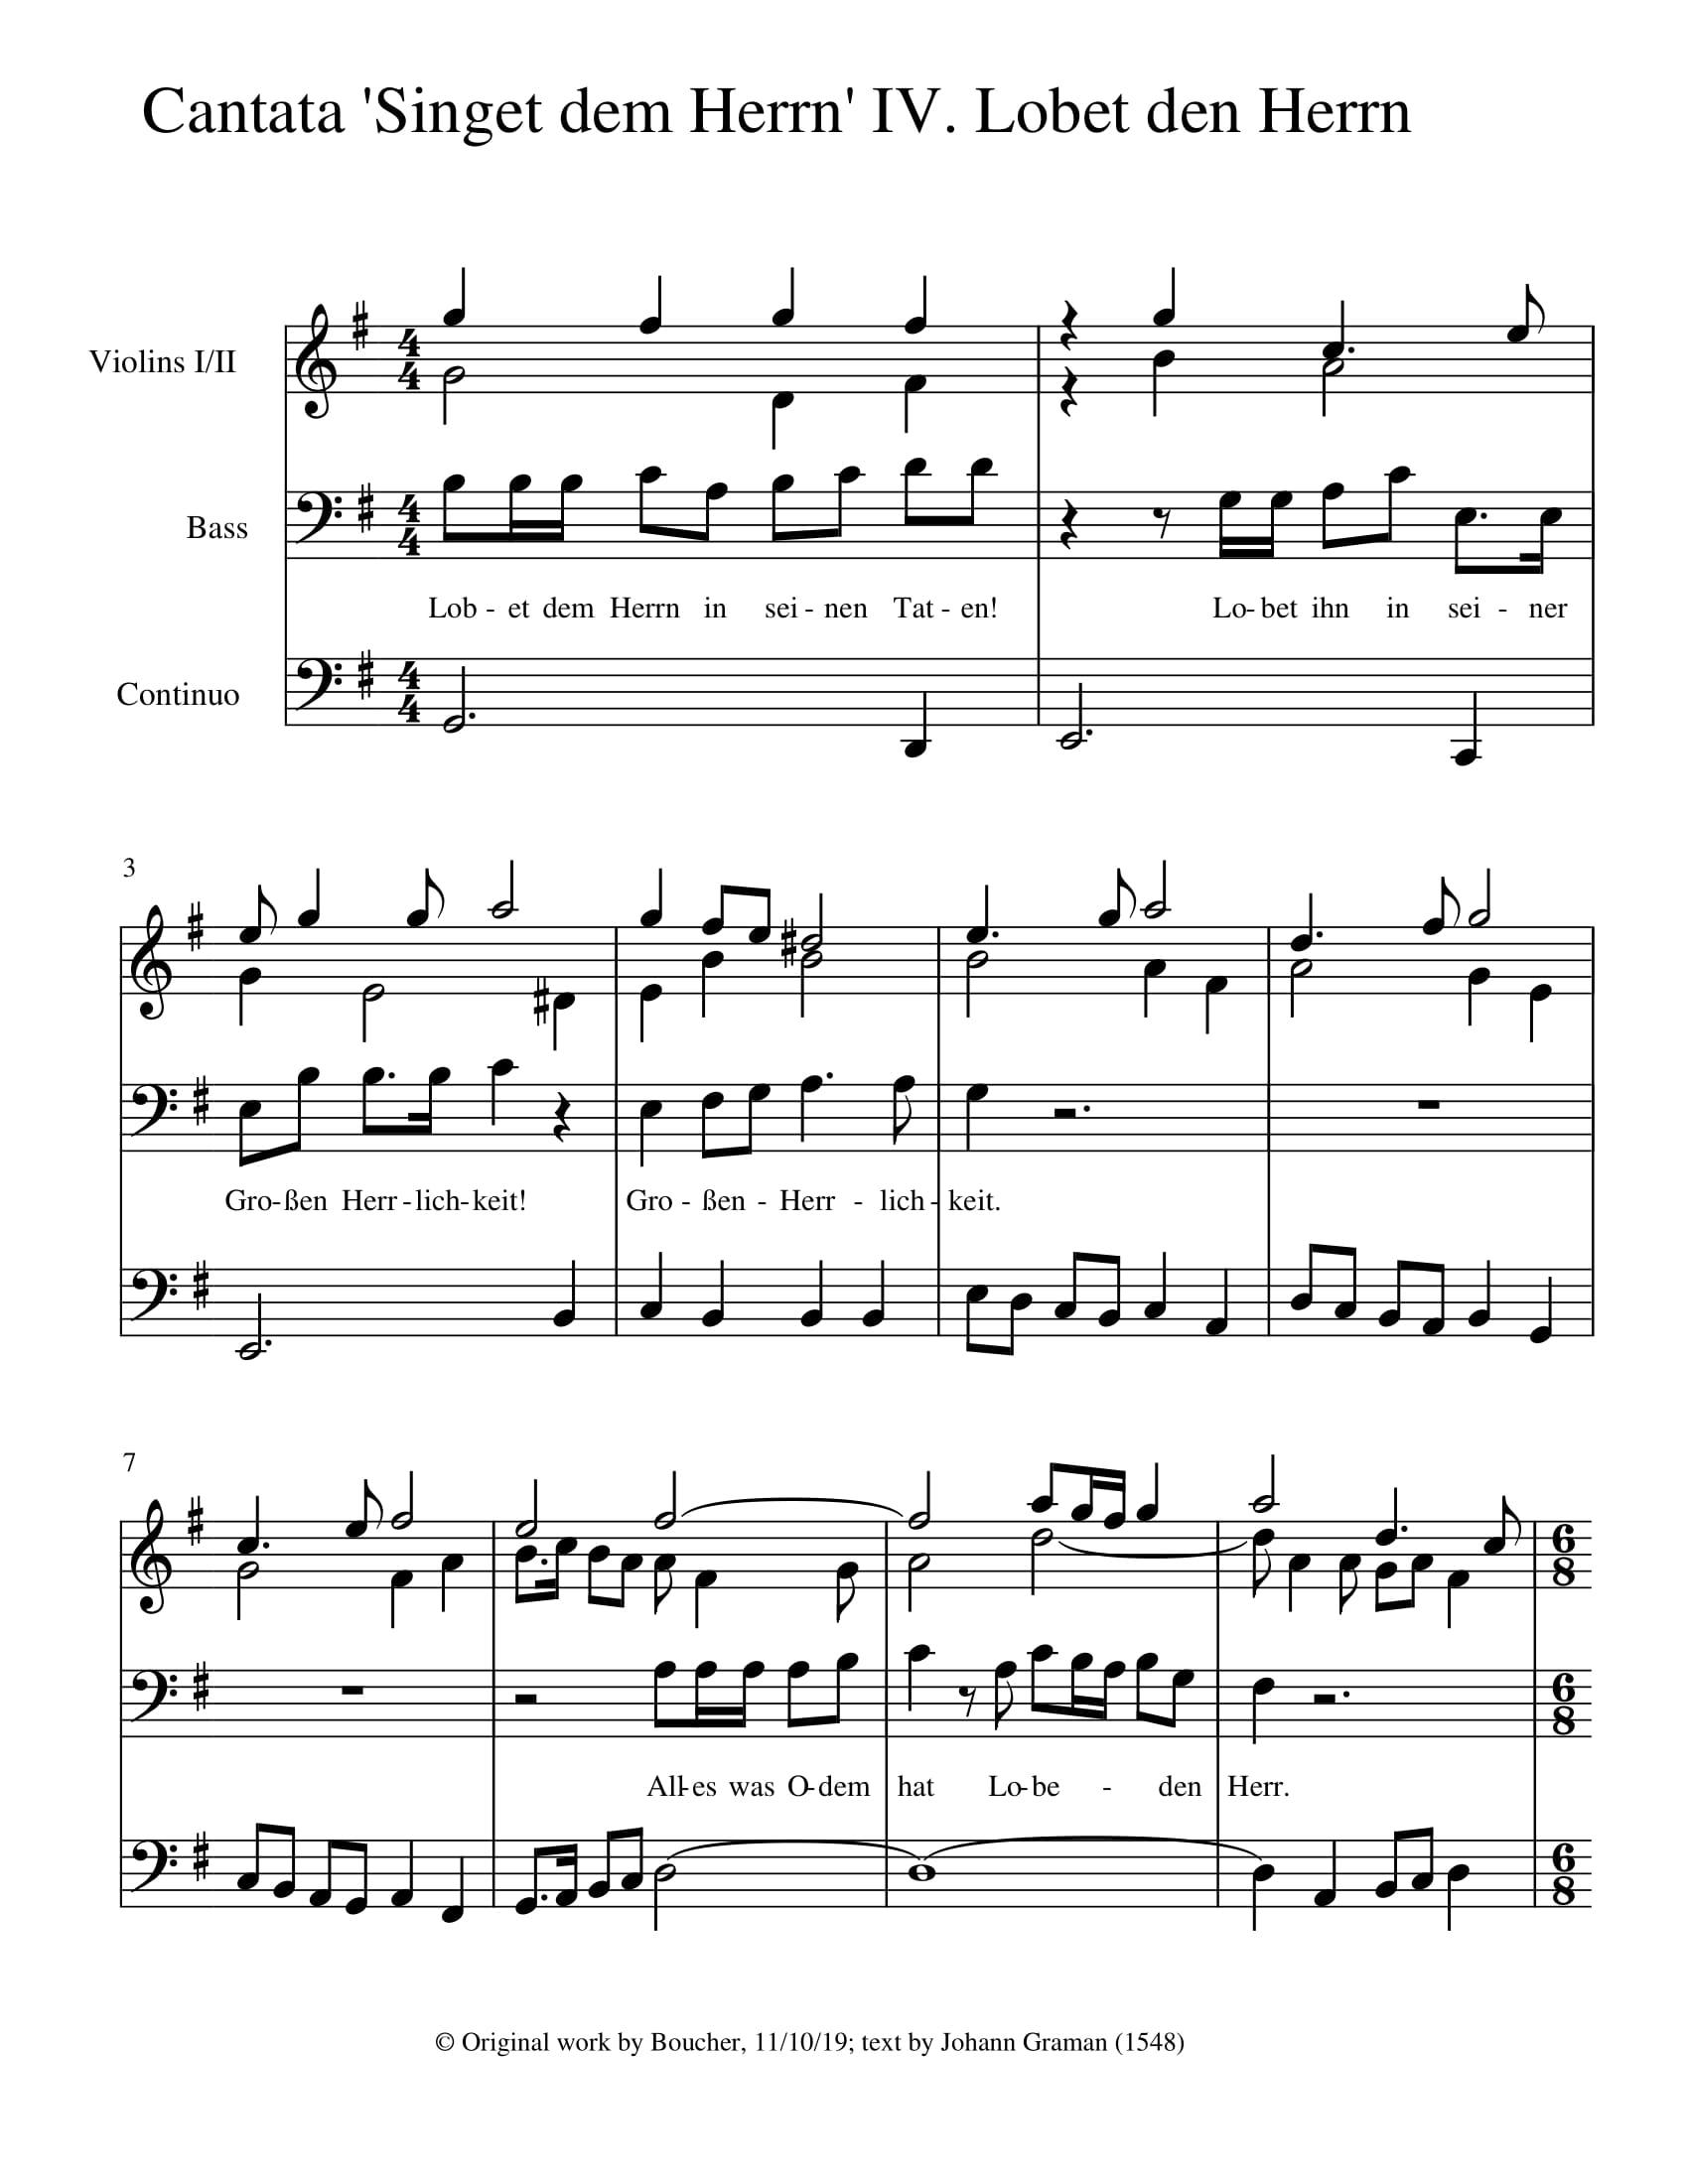 Singet dem Herrn: 4. Recitative